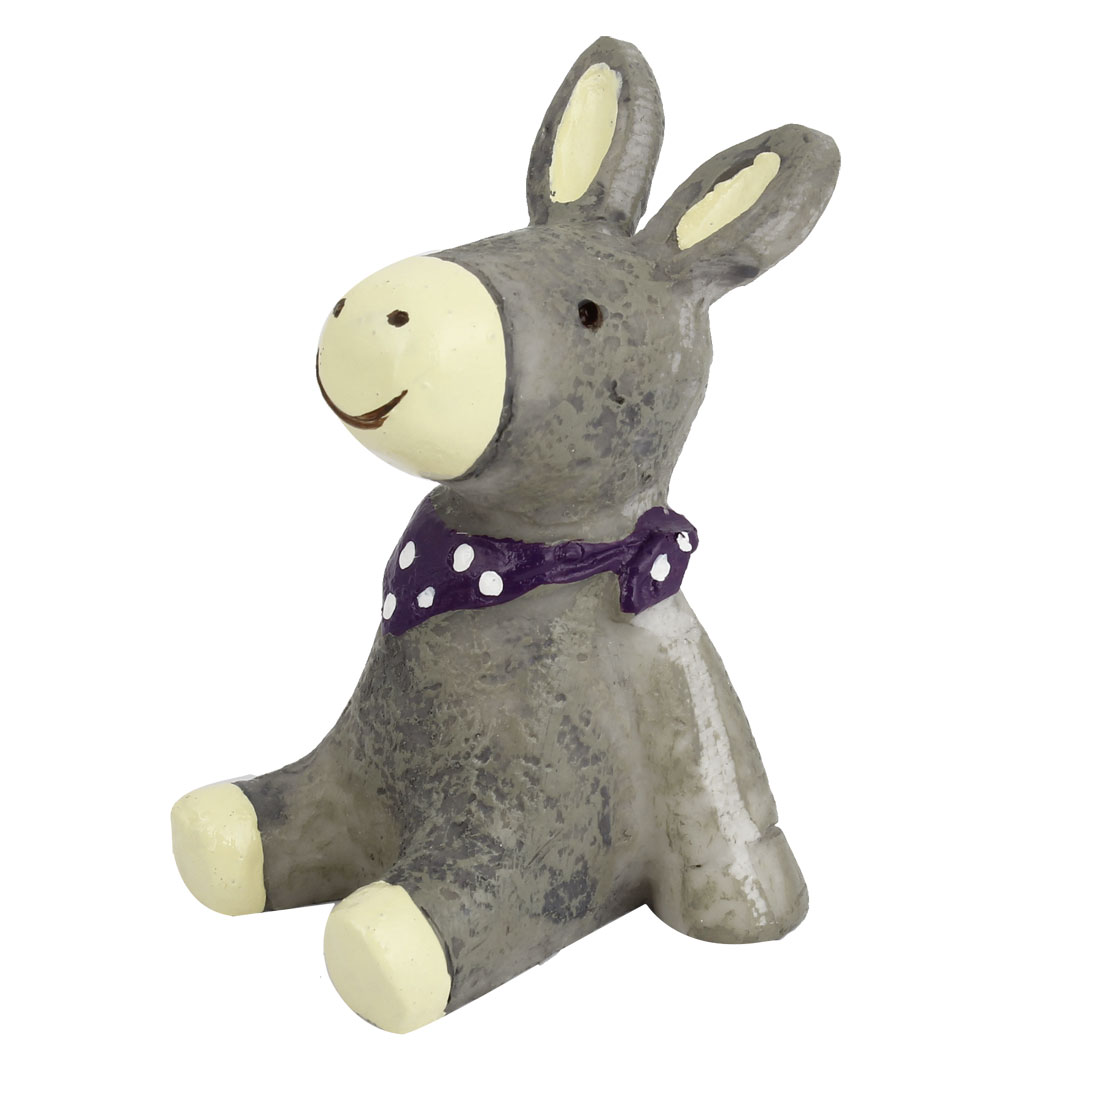 Tabletop Adorn Handmade Craft Donkey Shape Ornament Gray